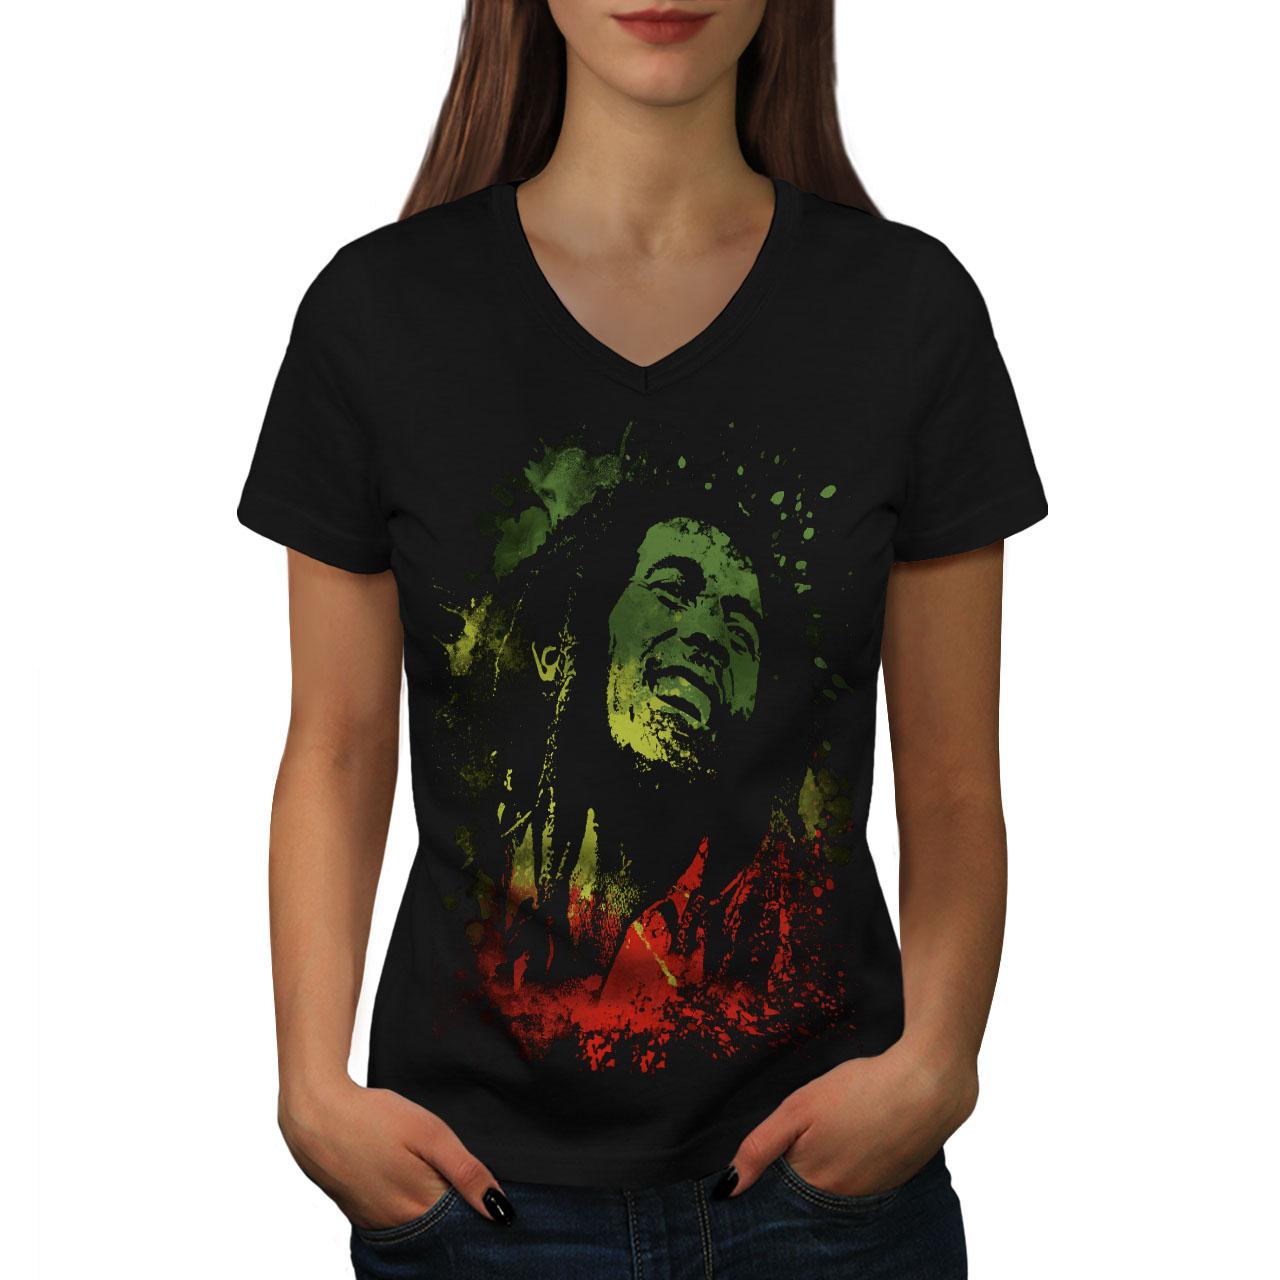 Infatigable Wellcoda Légende Bob Rasta Marley Femme T-shirt Col V, Rasta Design Graphique Tee-afficher Le Titre D'origine Correspondant En Couleur